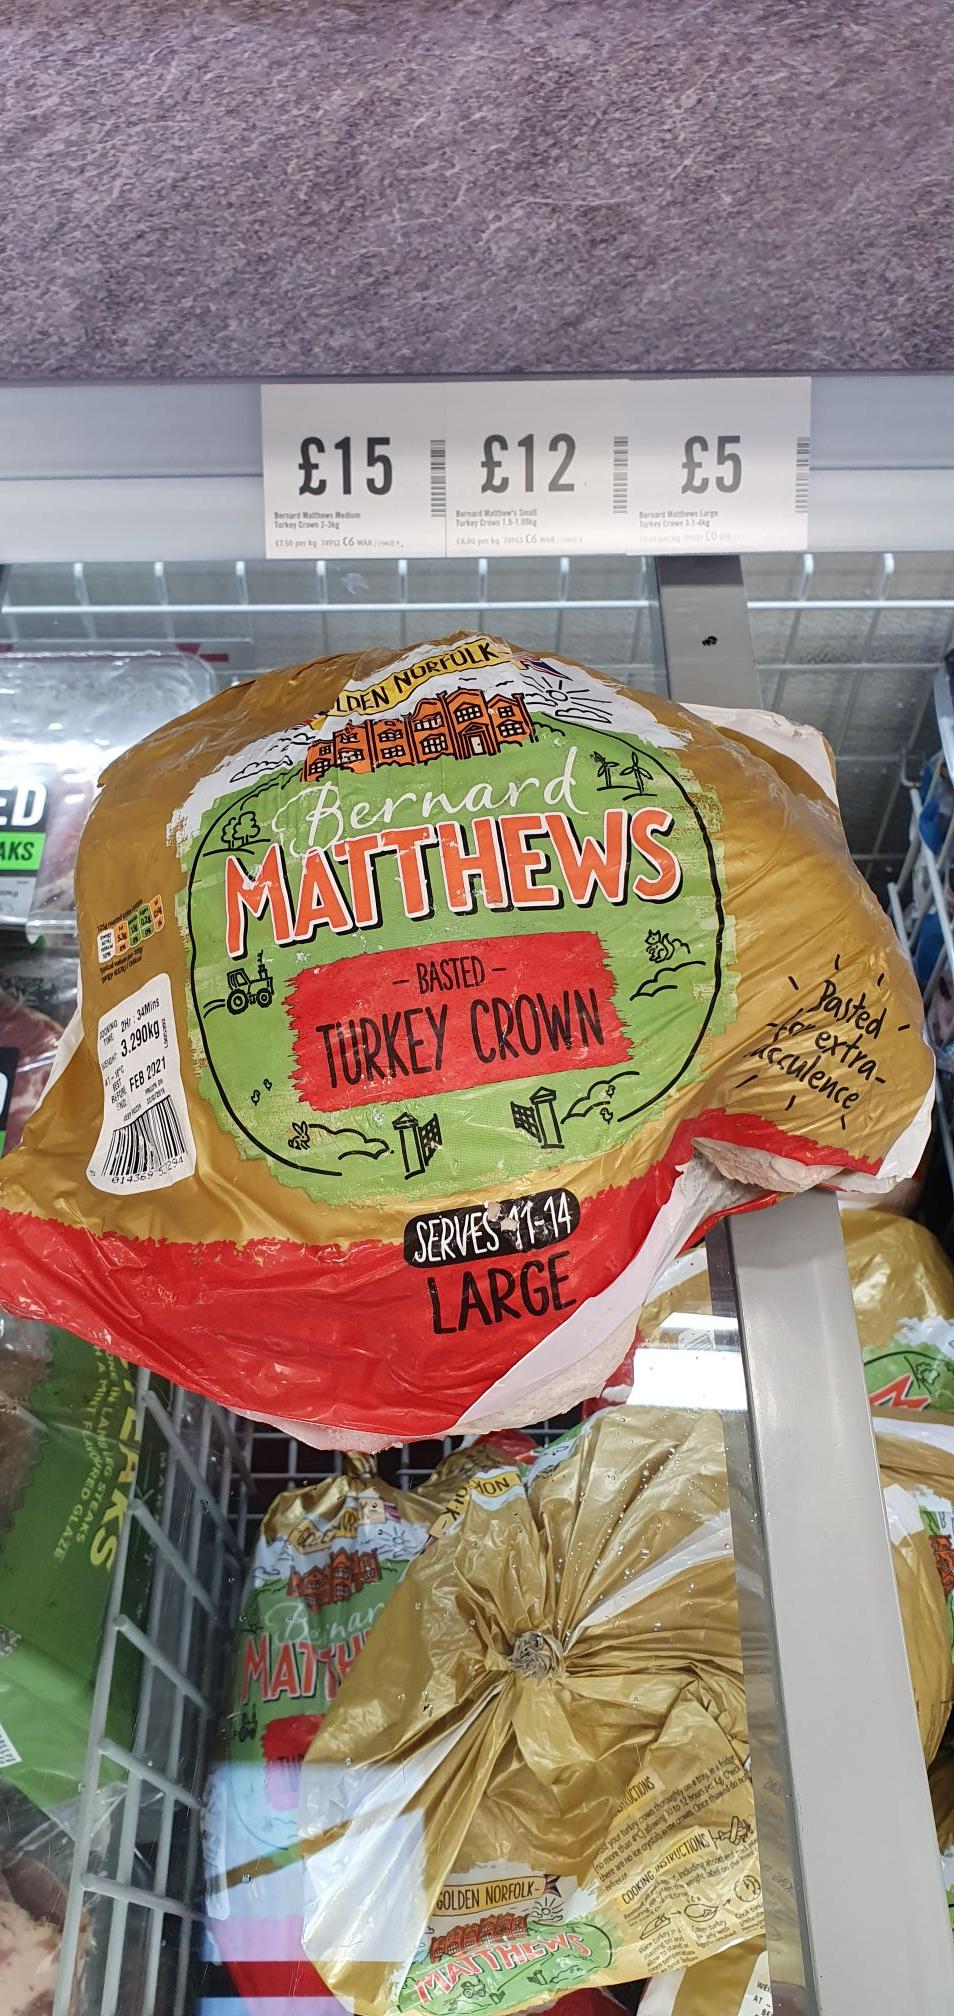 Bernard Matthews large Turkey crown £5 in store at Iceland Stoke on Trent